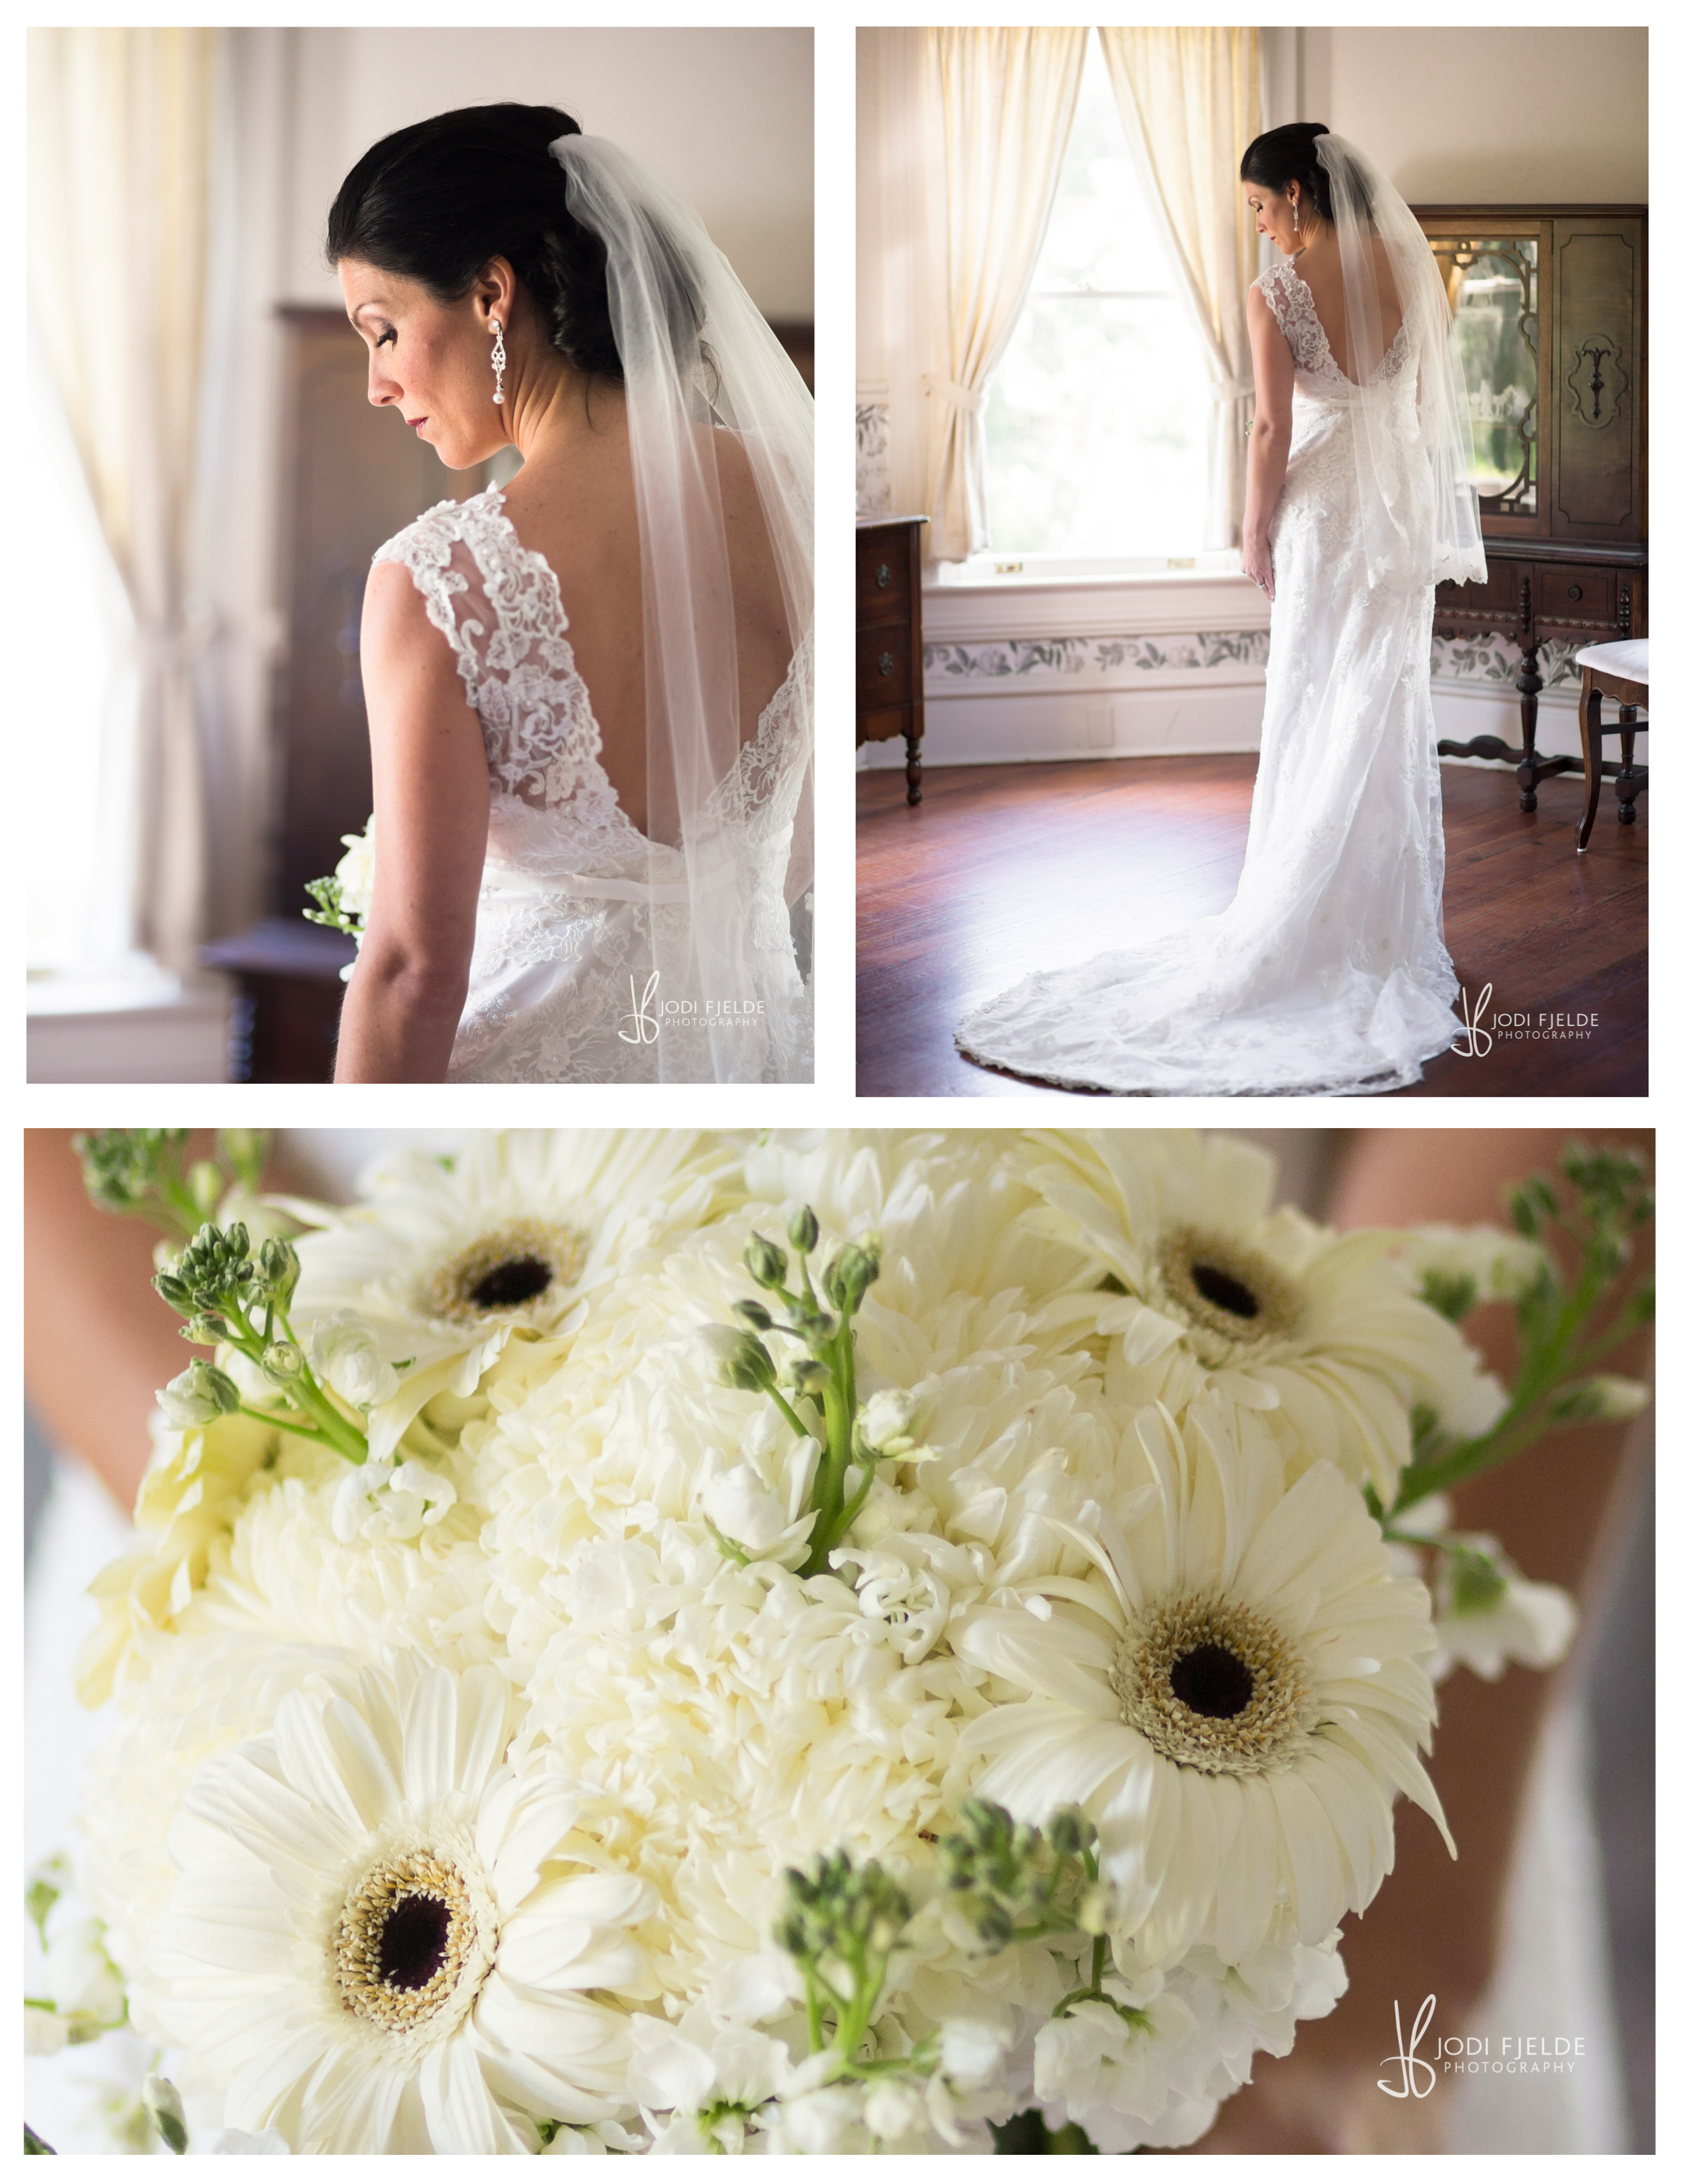 Highland_Manor_Apopka_Florida_wedding_Jackie_&_Tim_photography_jodi_Fjelde_photography-9.jpg